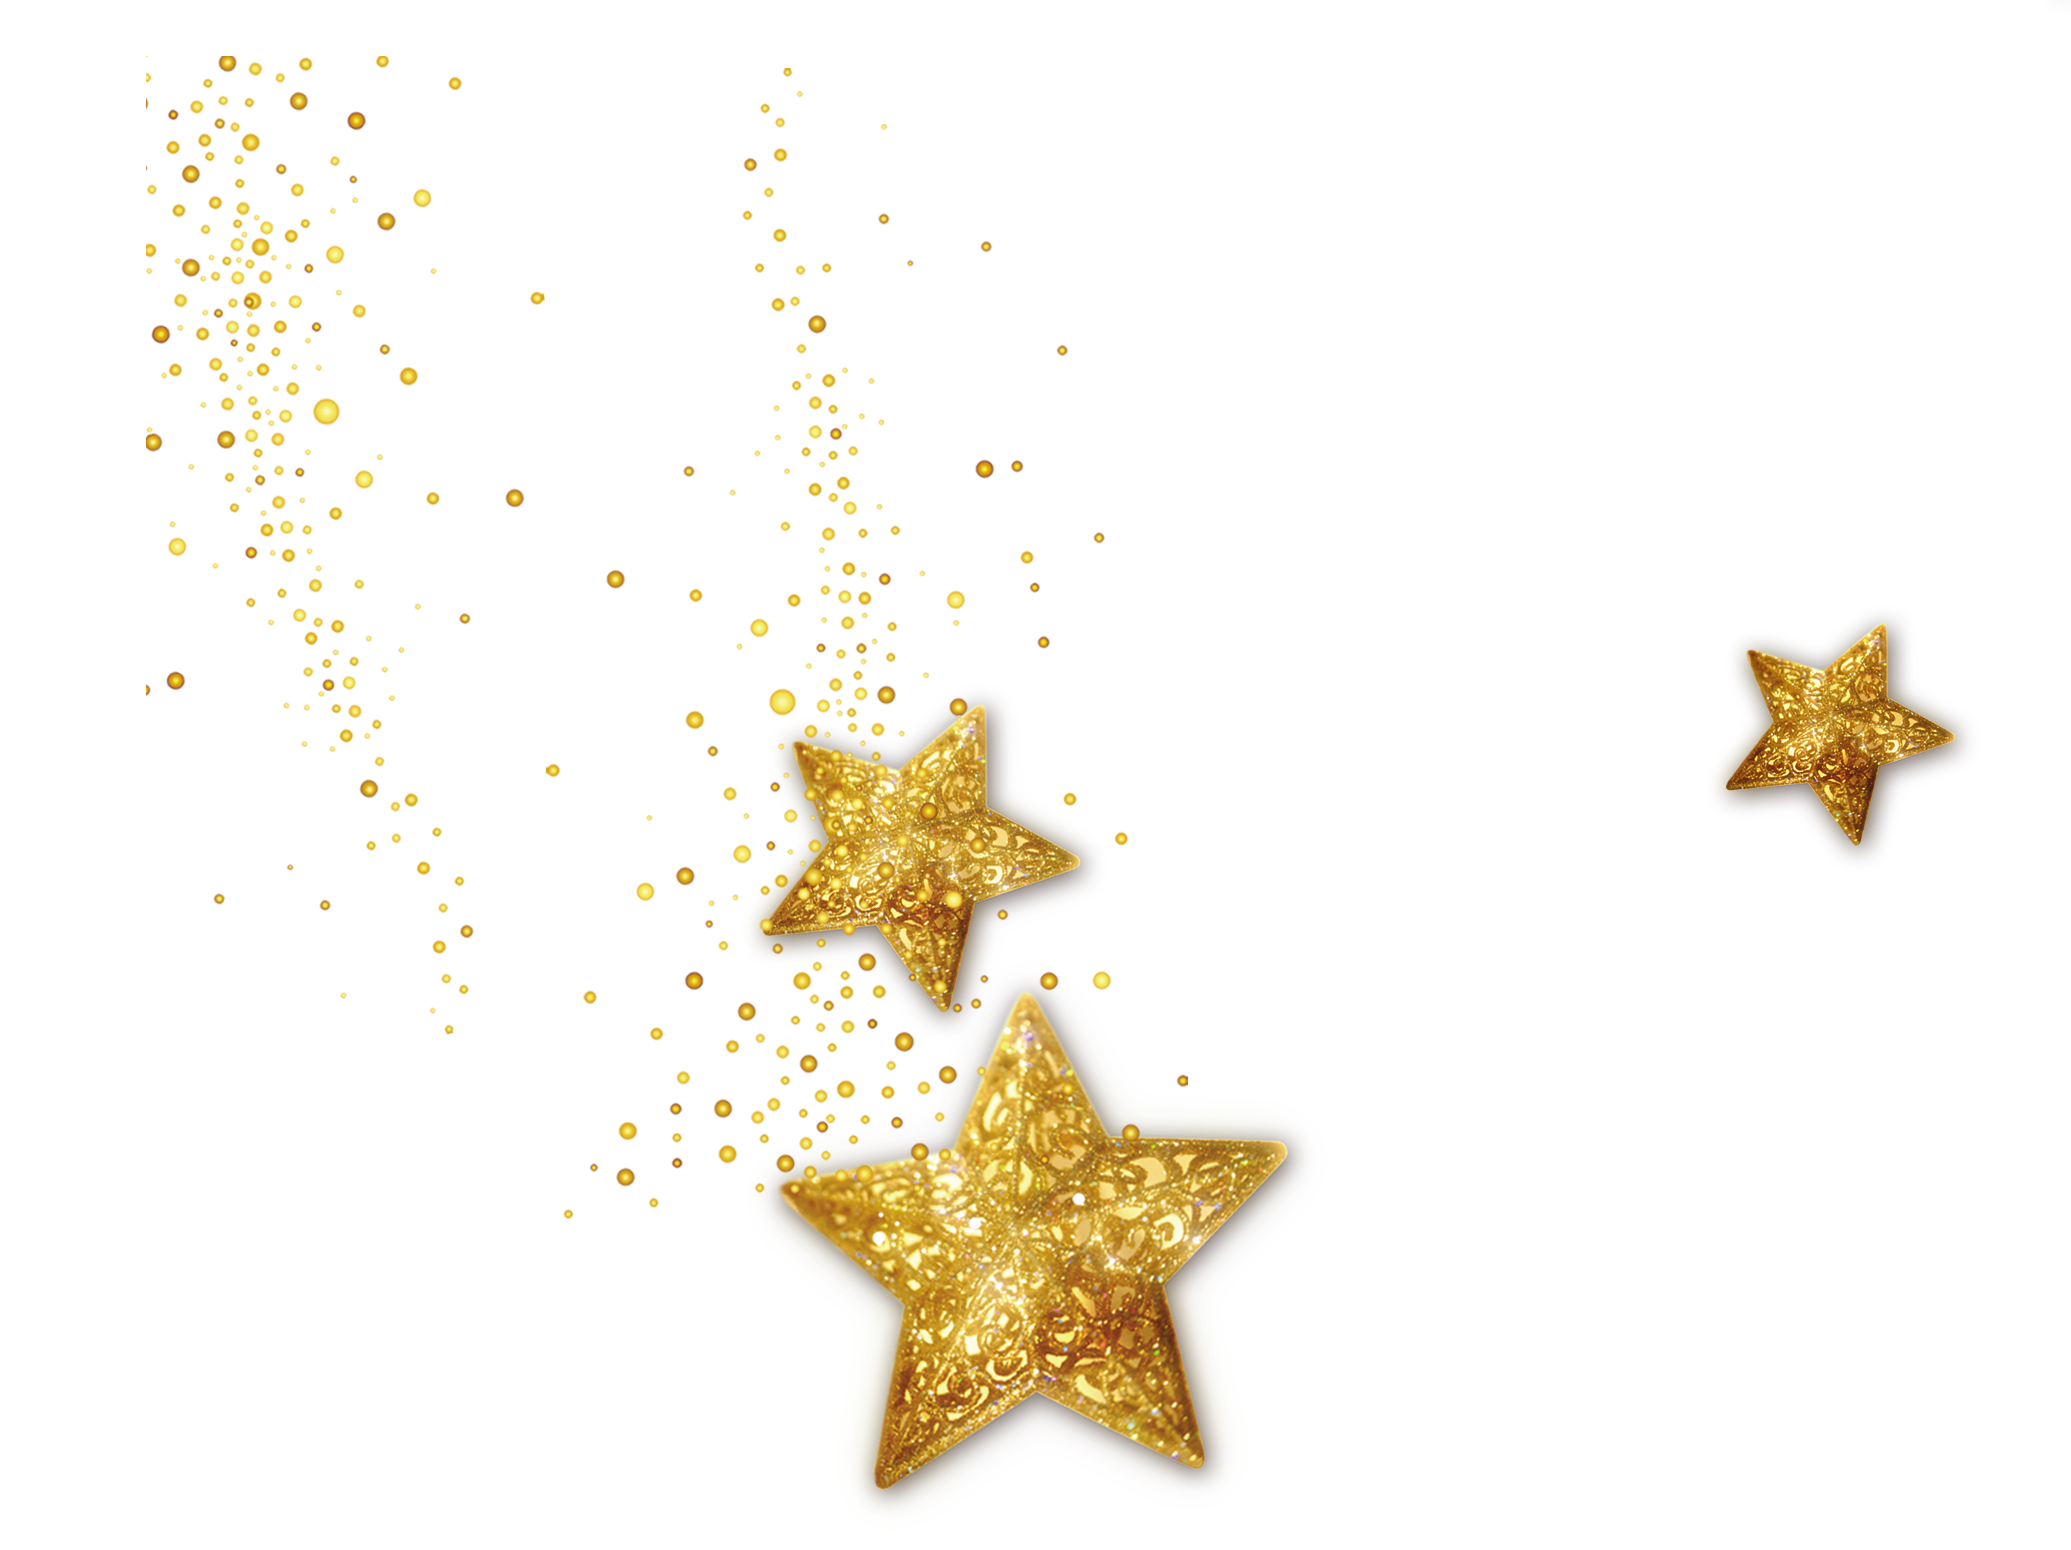 stars star glittery glitter golden gold sparkles sparkl...